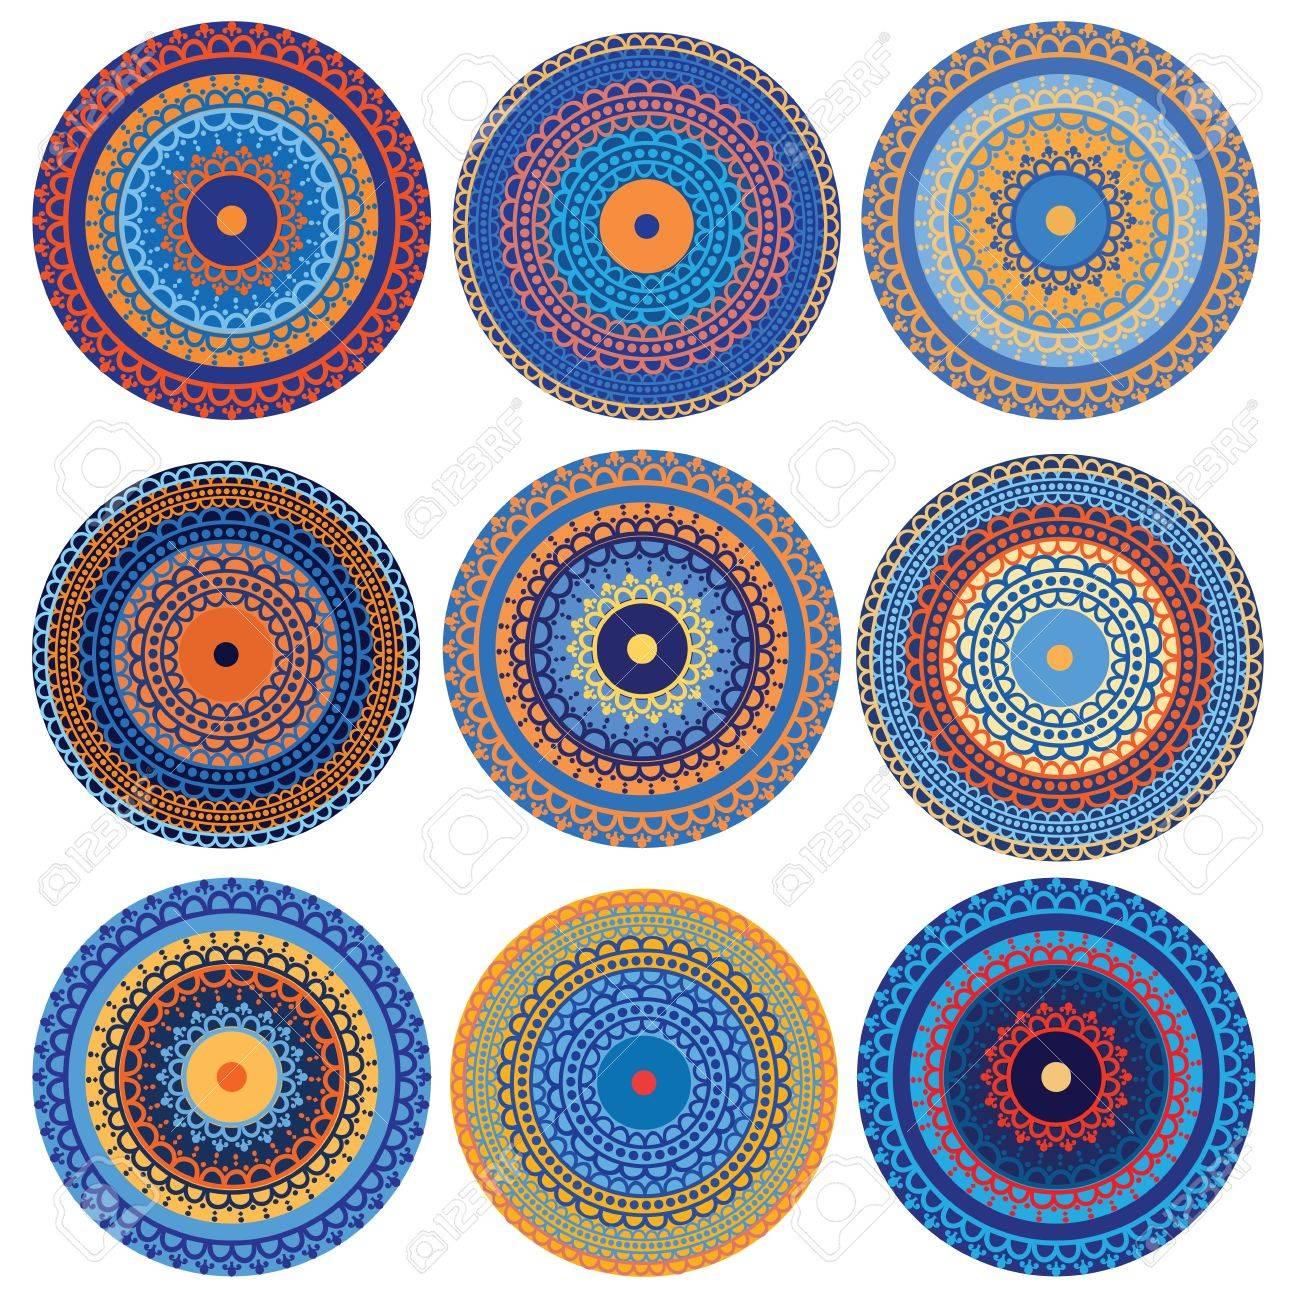 Colorful Henna Mandala design, very elaborate and easily editable Stock Vector - 10607177